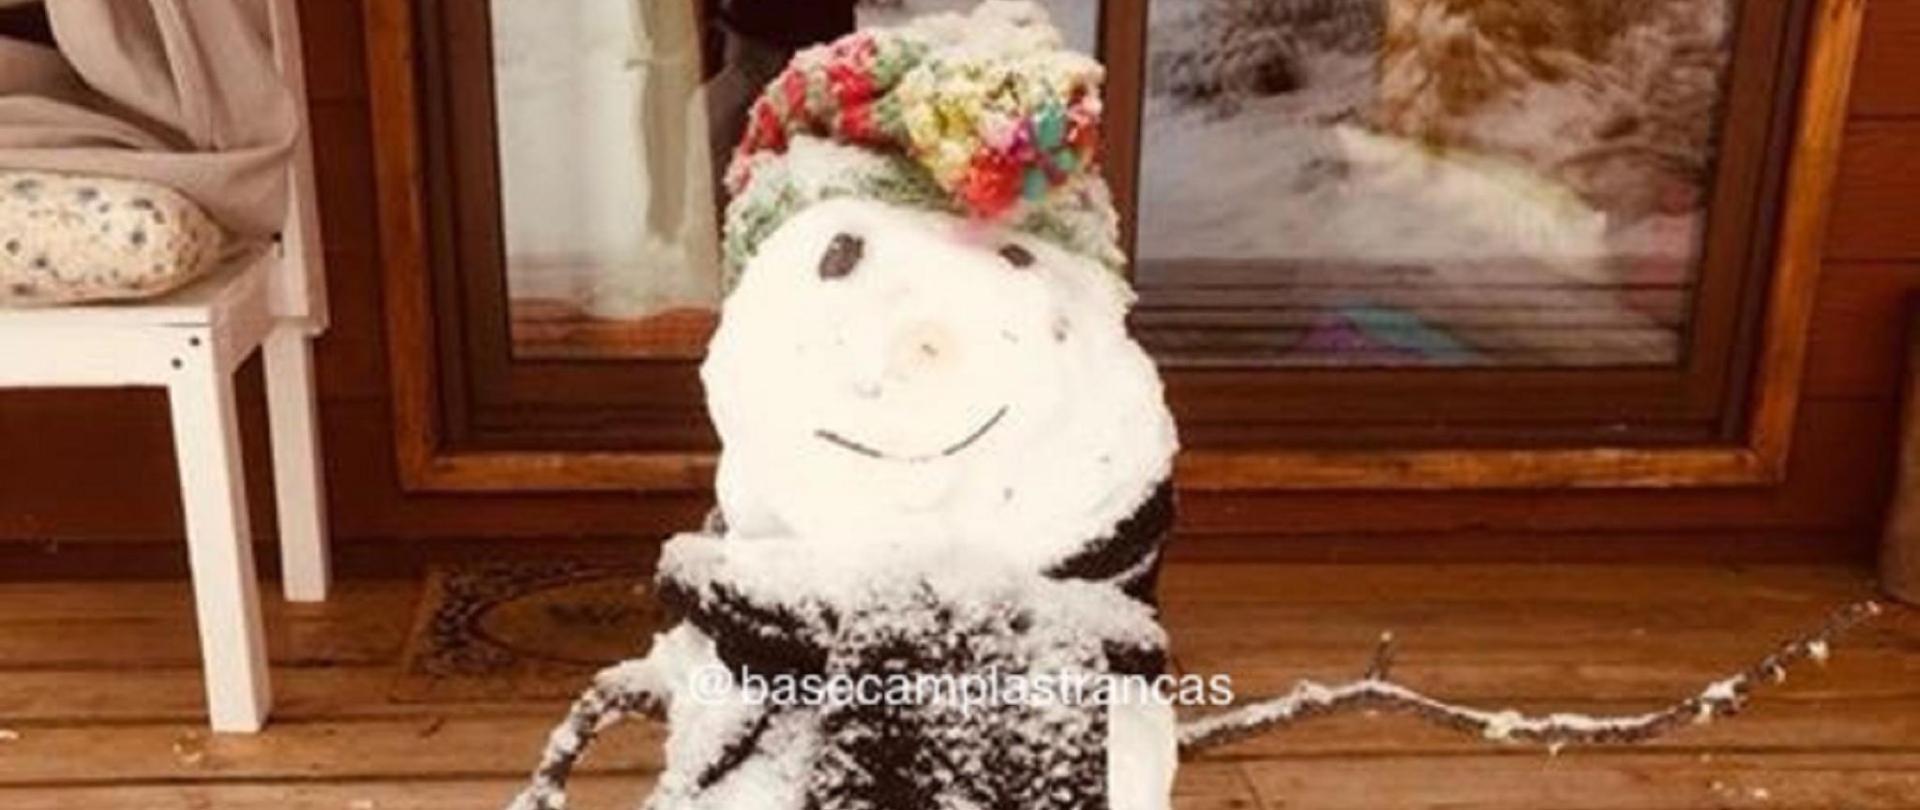 winter 6.jpg